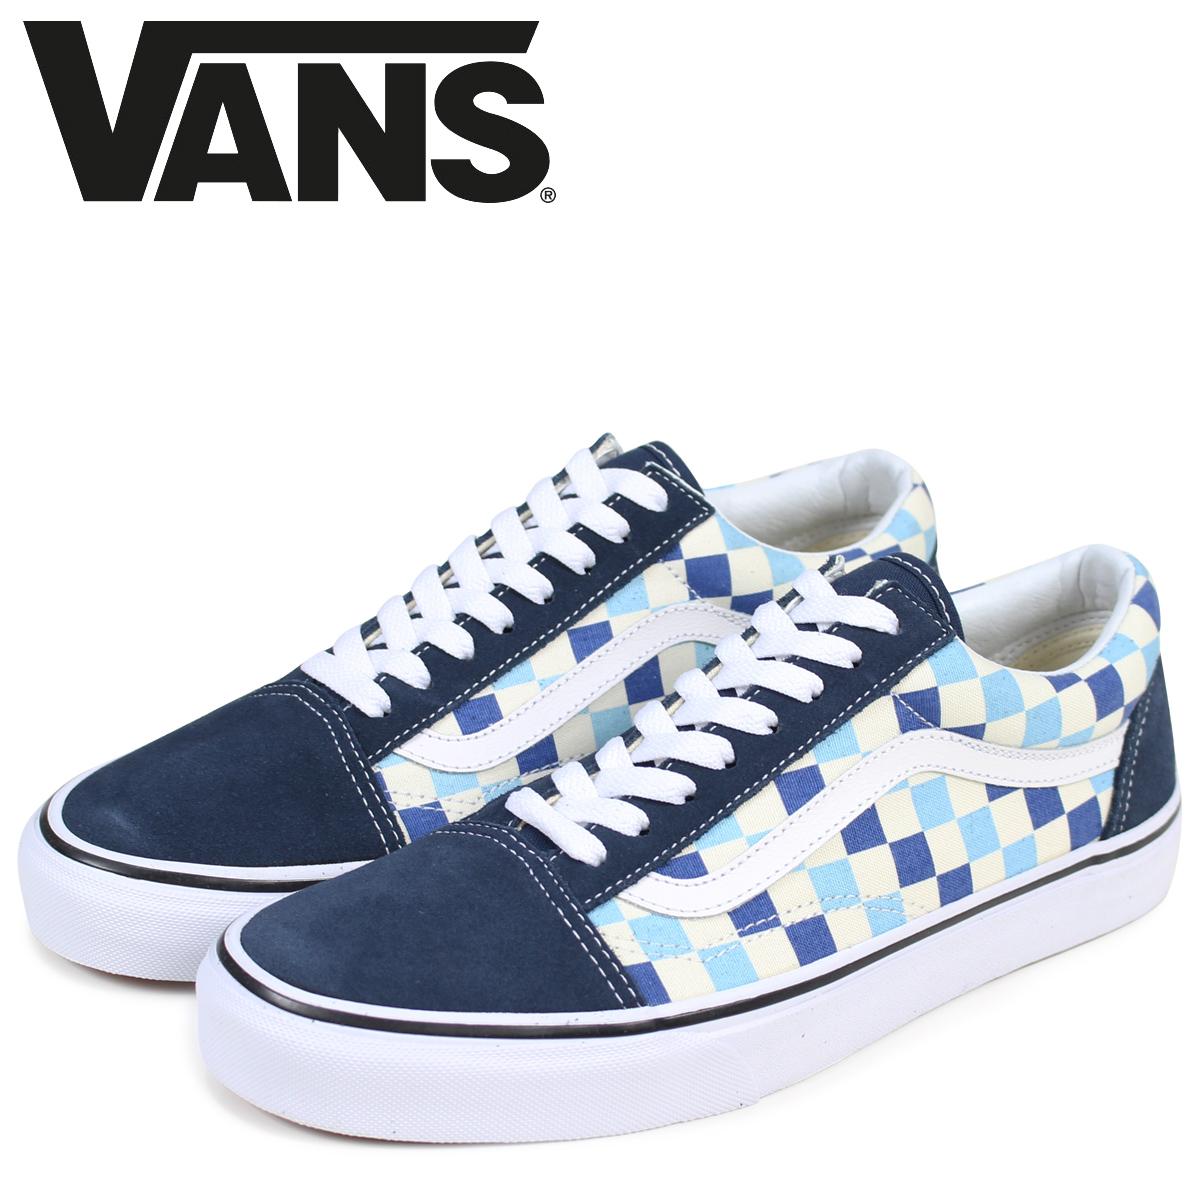 980aac941c4 Sugar Online Shop  Vans old school sneakers men VANS station wagons ...